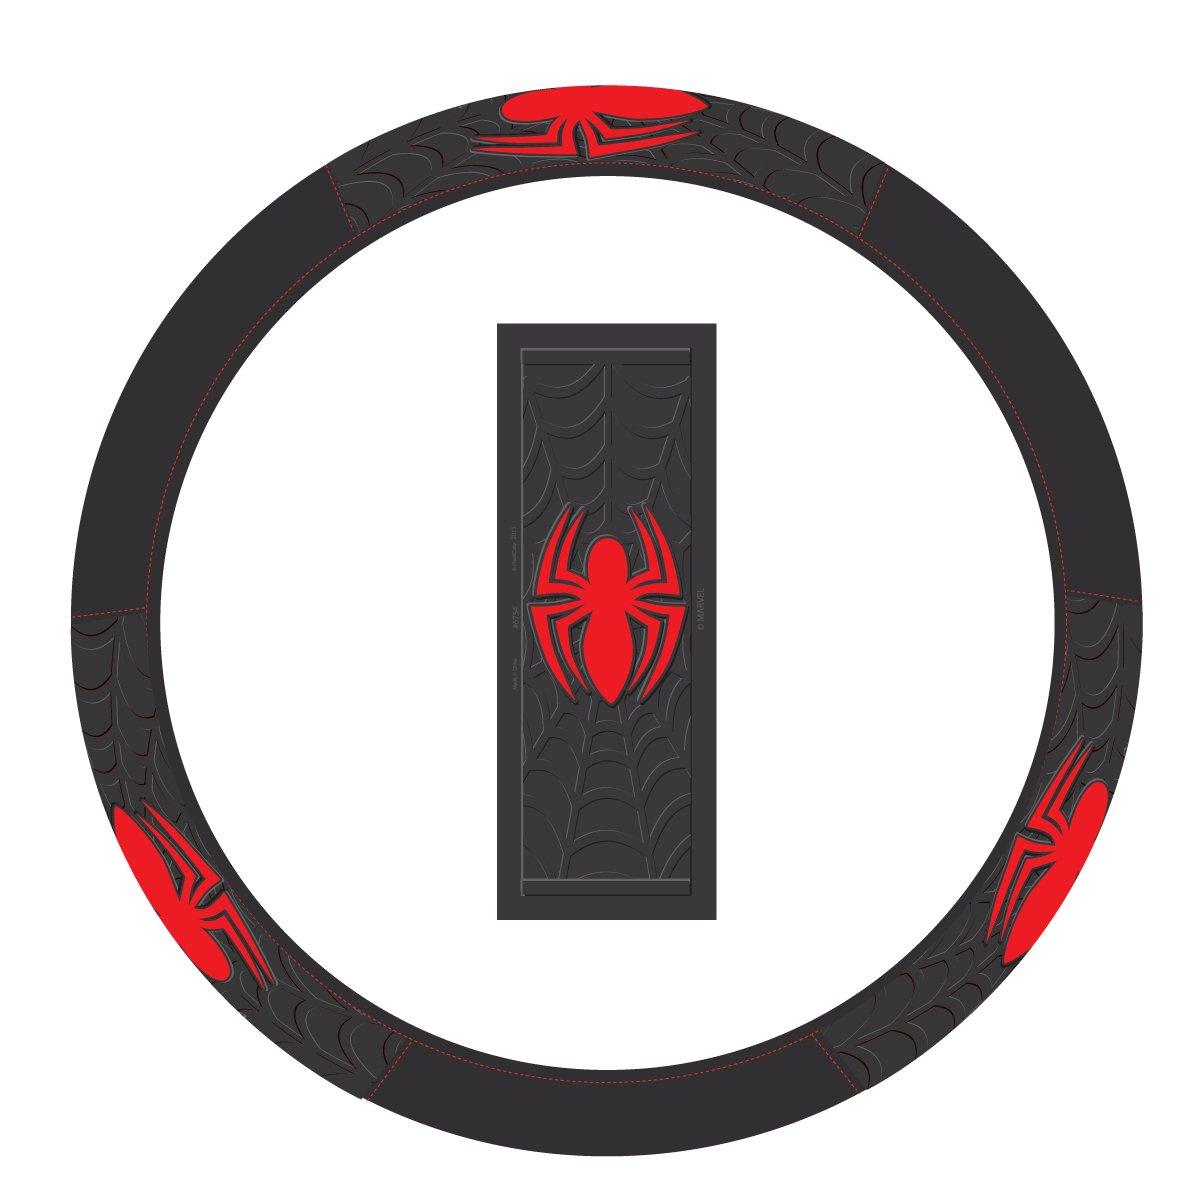 Plasticolor 006754R01 'Spiderman' Steering Wheel Cover